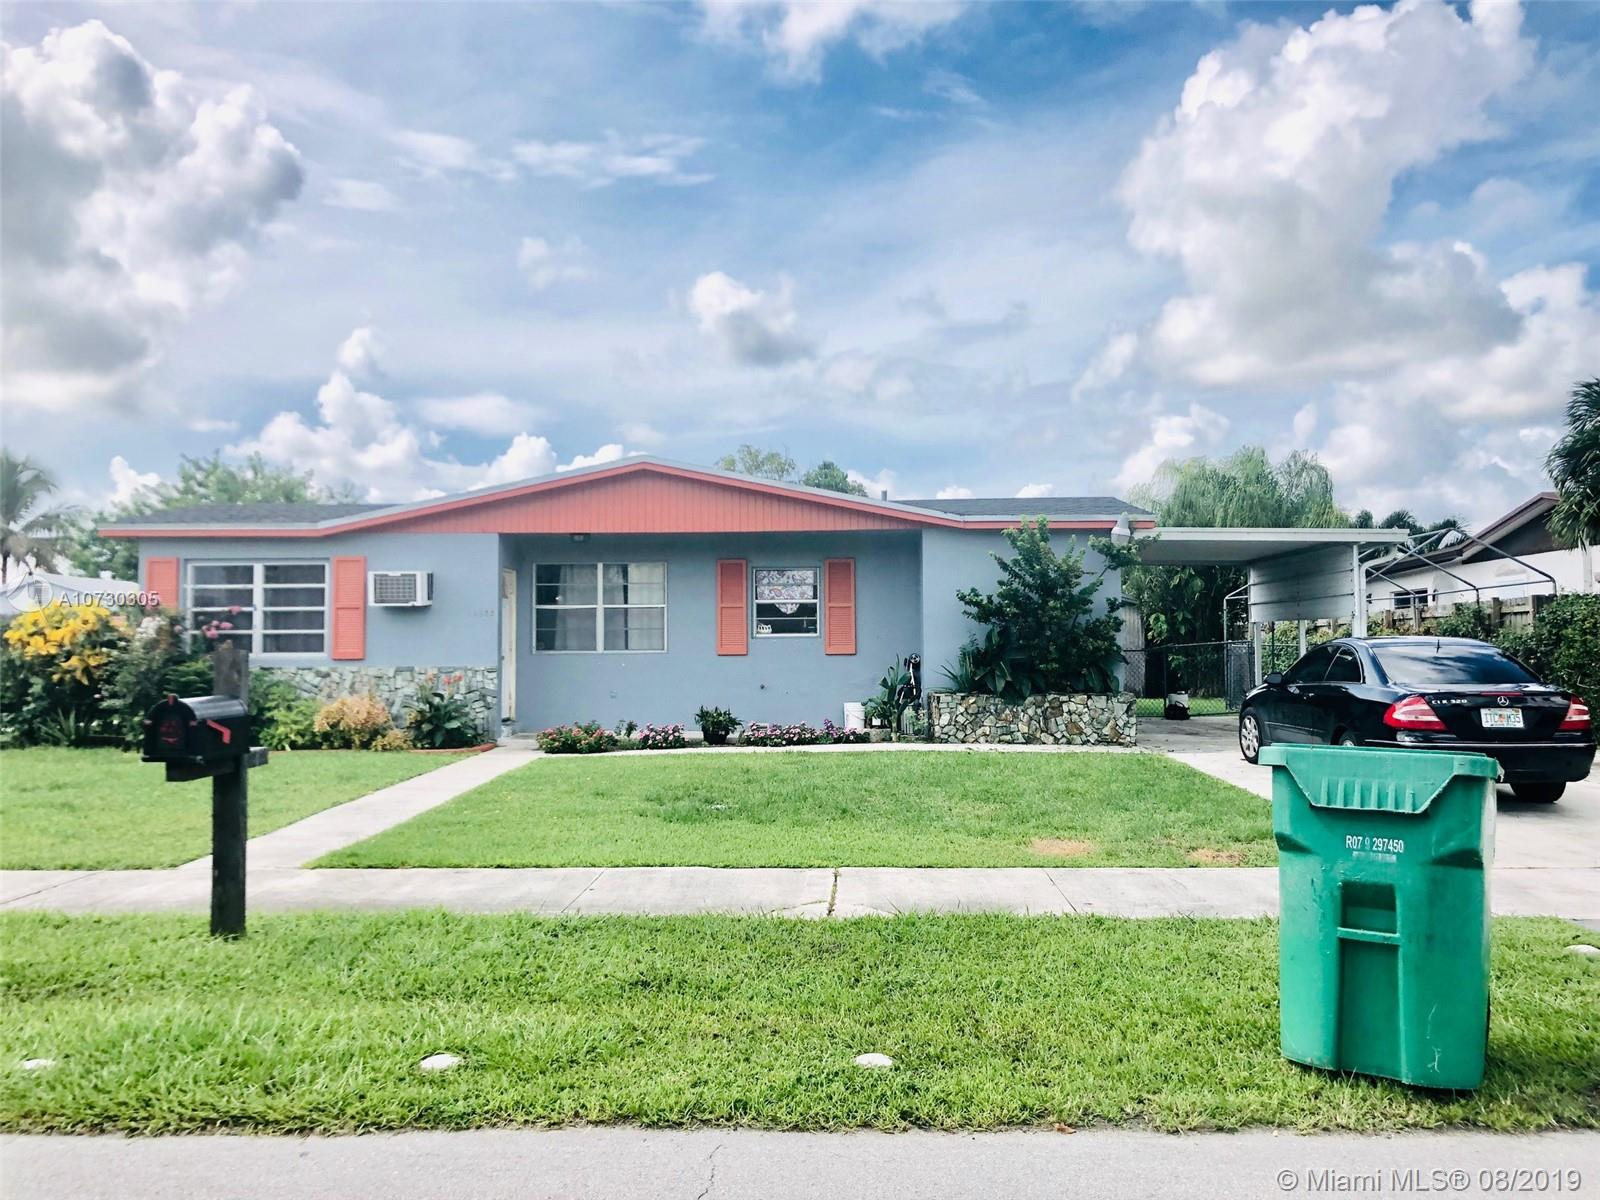 14932 SW 297th Terr, Homestead, FL 33033 - Homestead, FL real estate listing